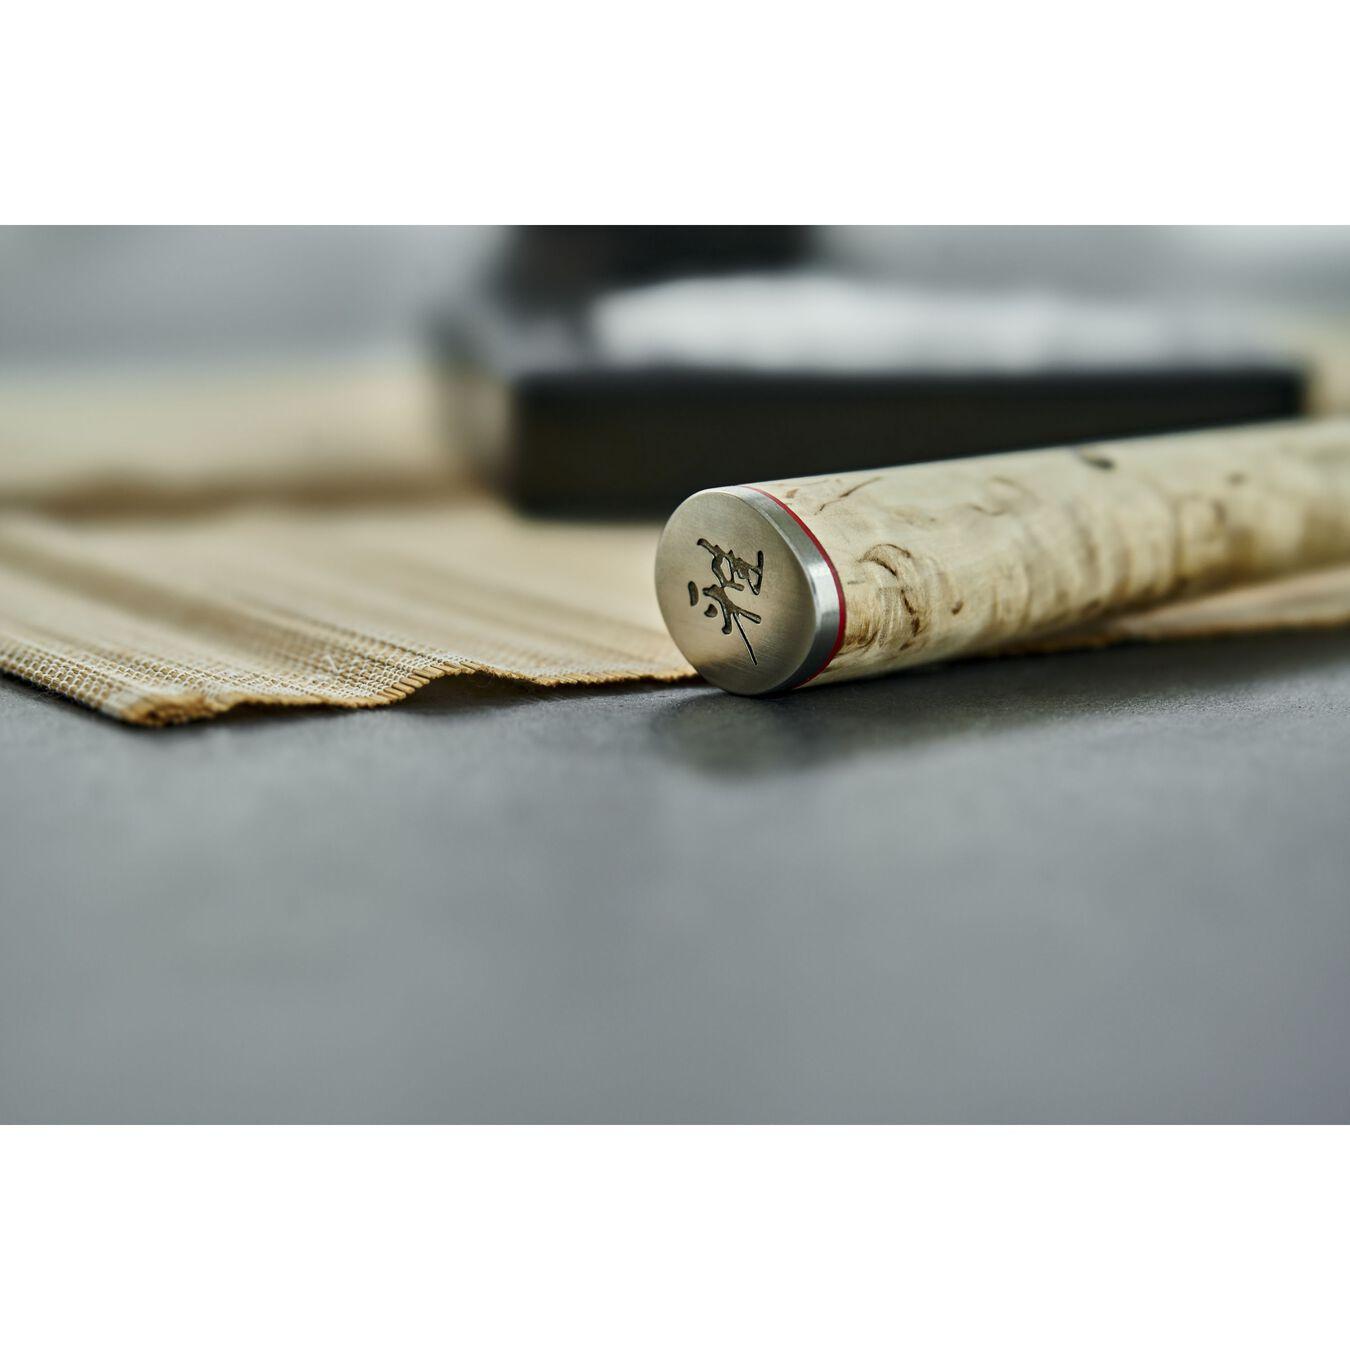 Brotmesser 23 cm, Birke,,large 3